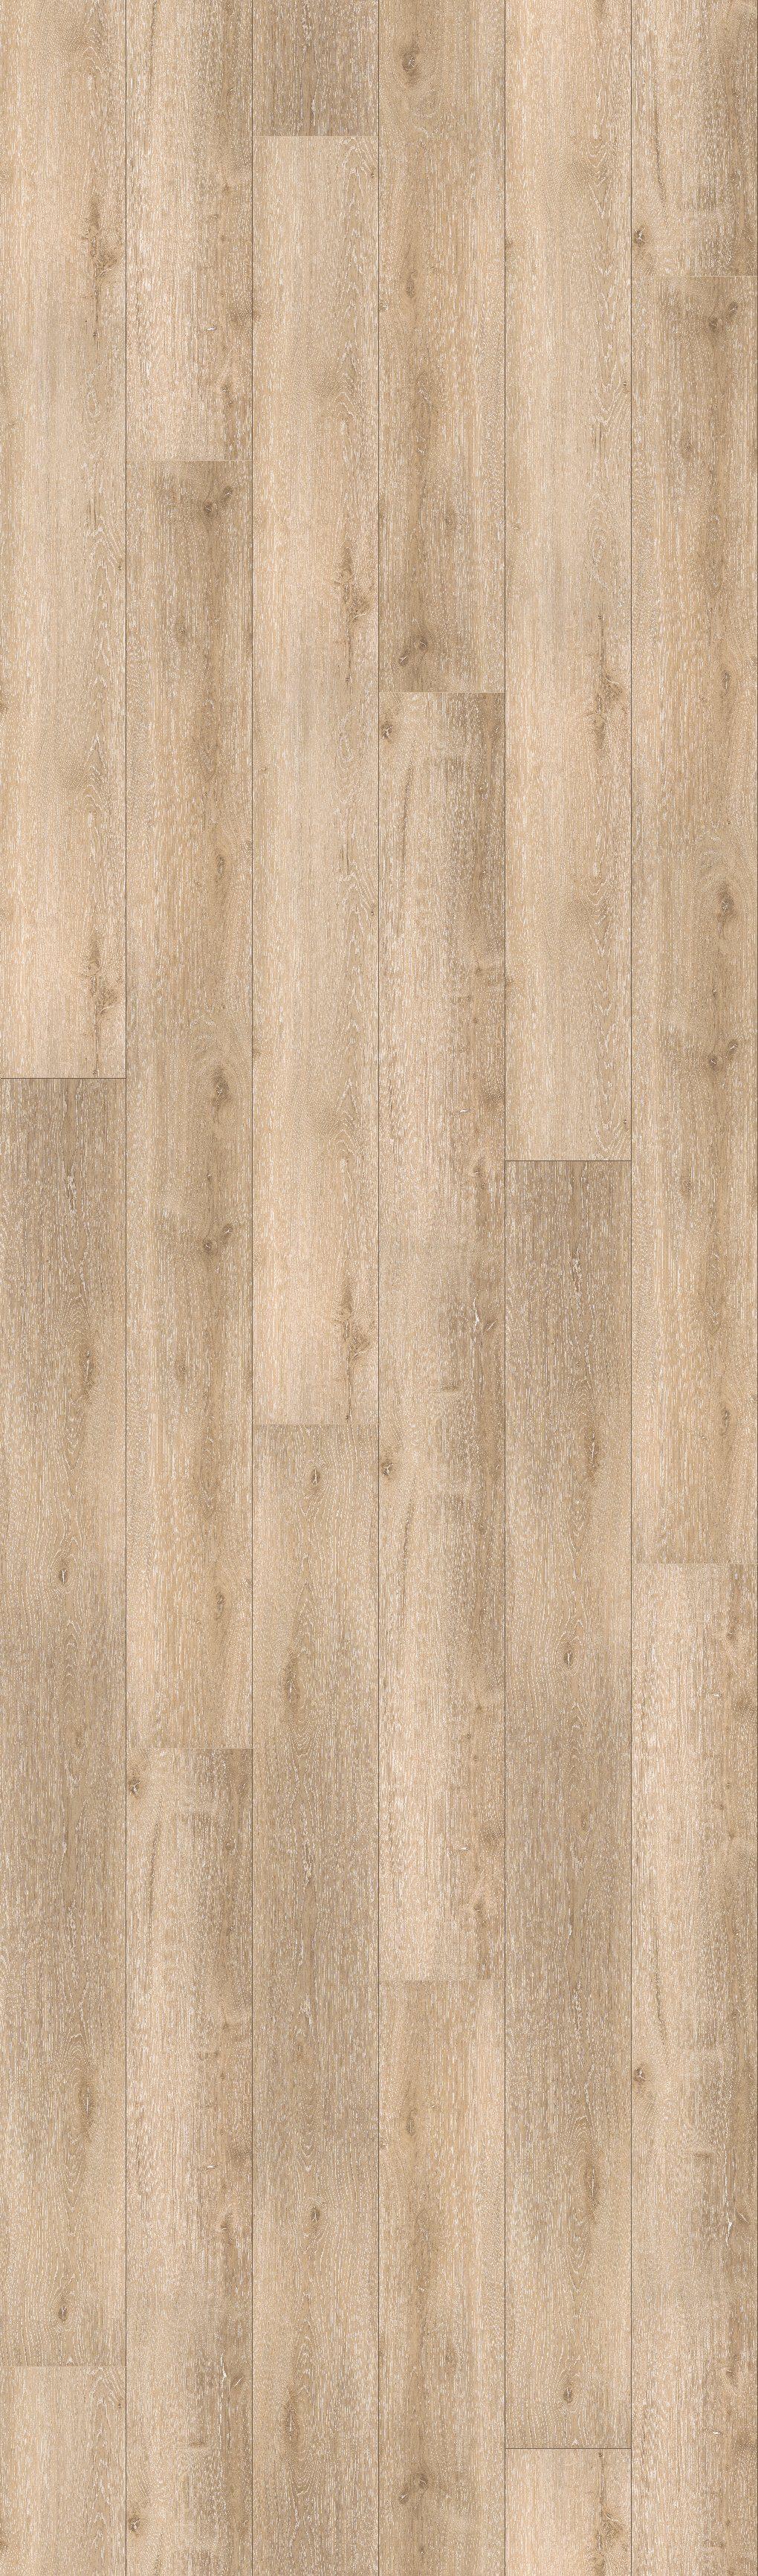 PARADOR Packung: Vinylboden »Basic 30 - Schlossdiele Eiche Royal hell gekälkt«, 2203 x 216 x 8,4 mm, 2,4 m²